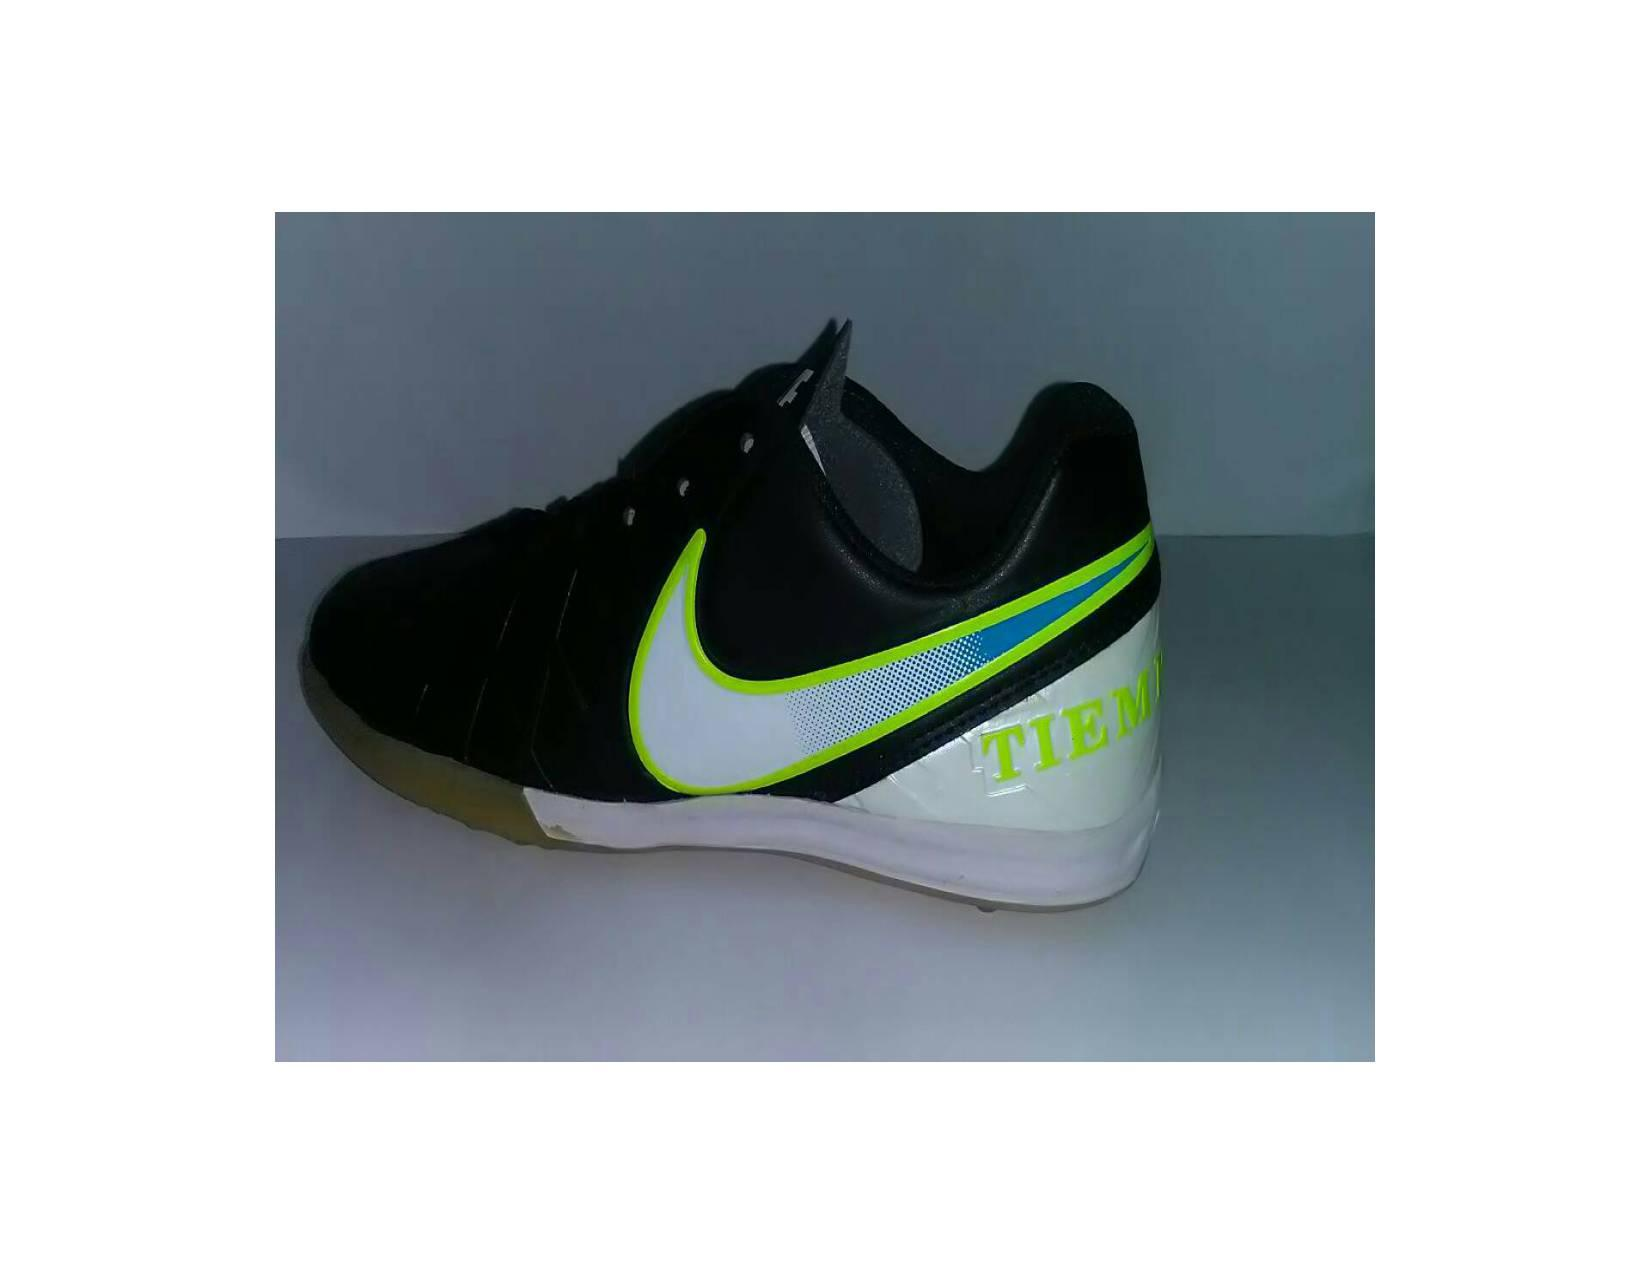 Sepatu futsal Nike Tiempo ACC Hitam putih hijau/Kw super /murah meriah